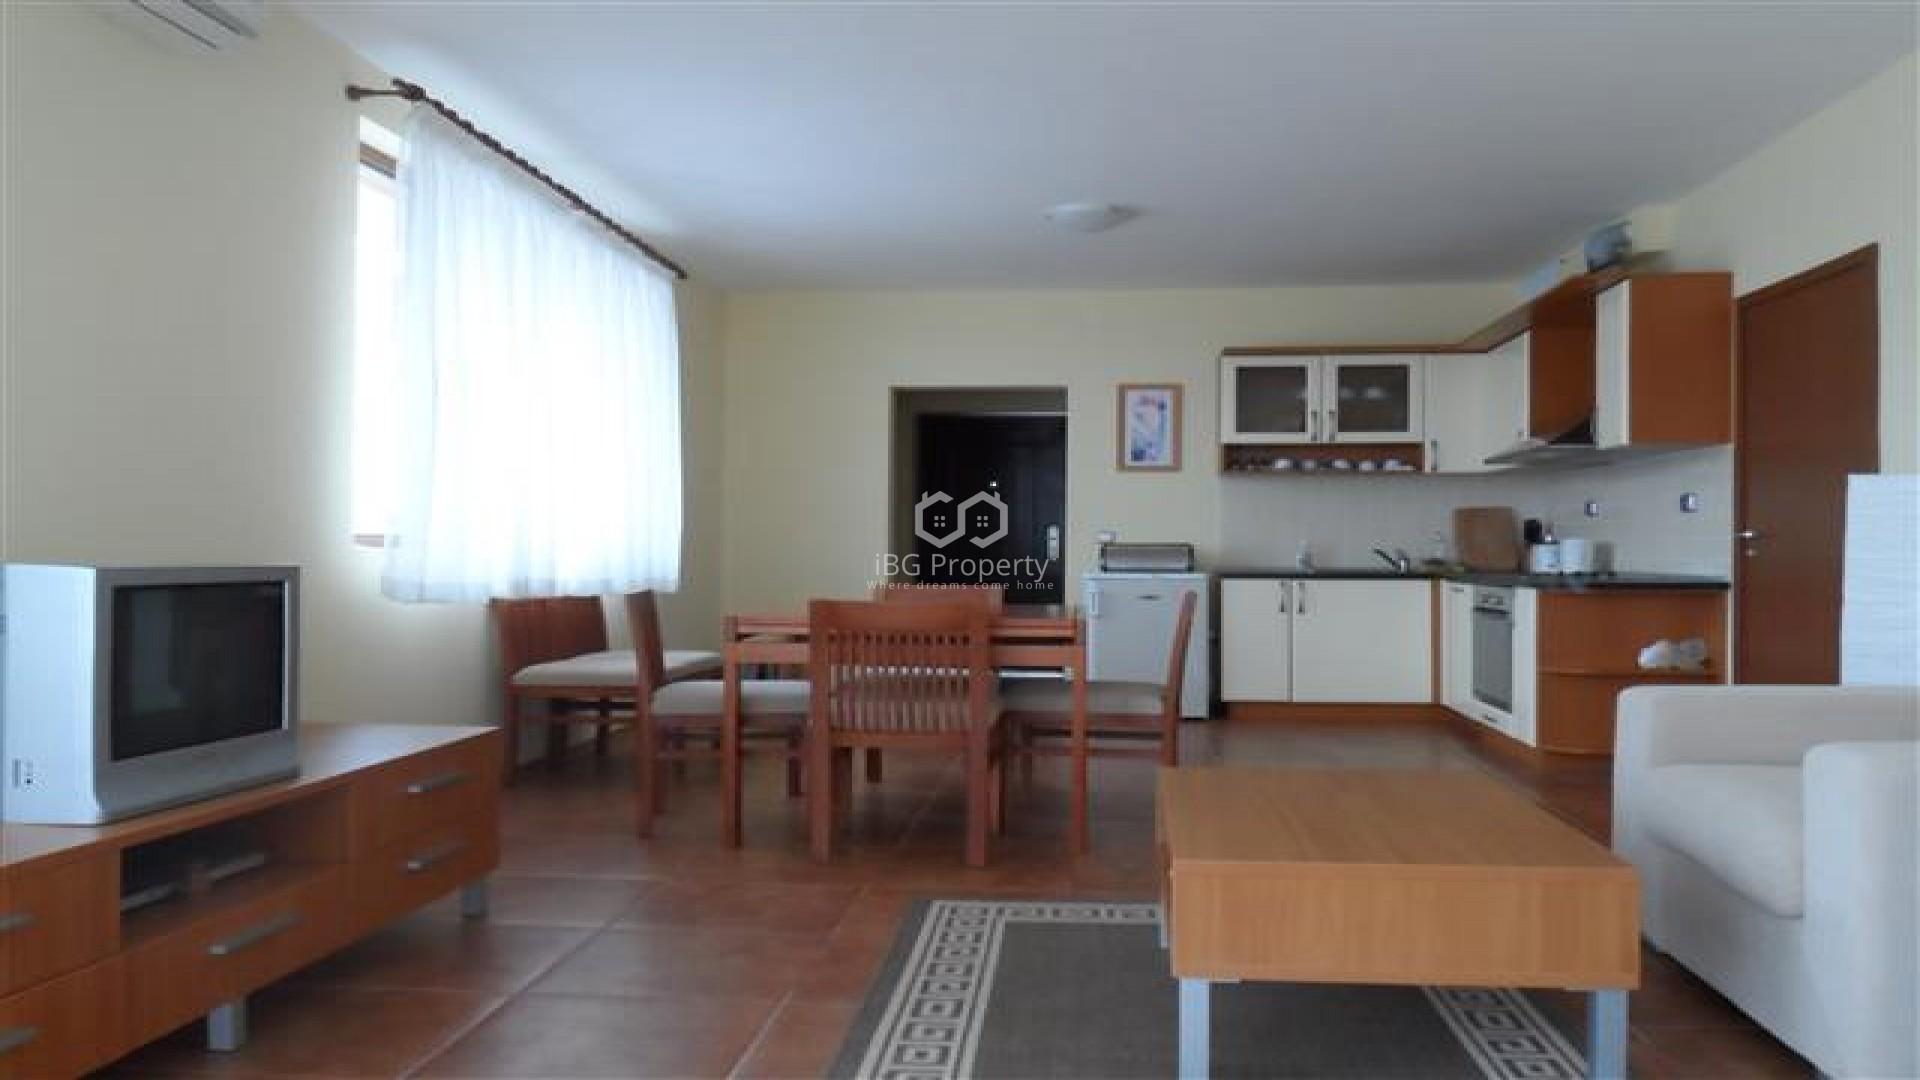 Tристаен апартамент Бяла 108 m2